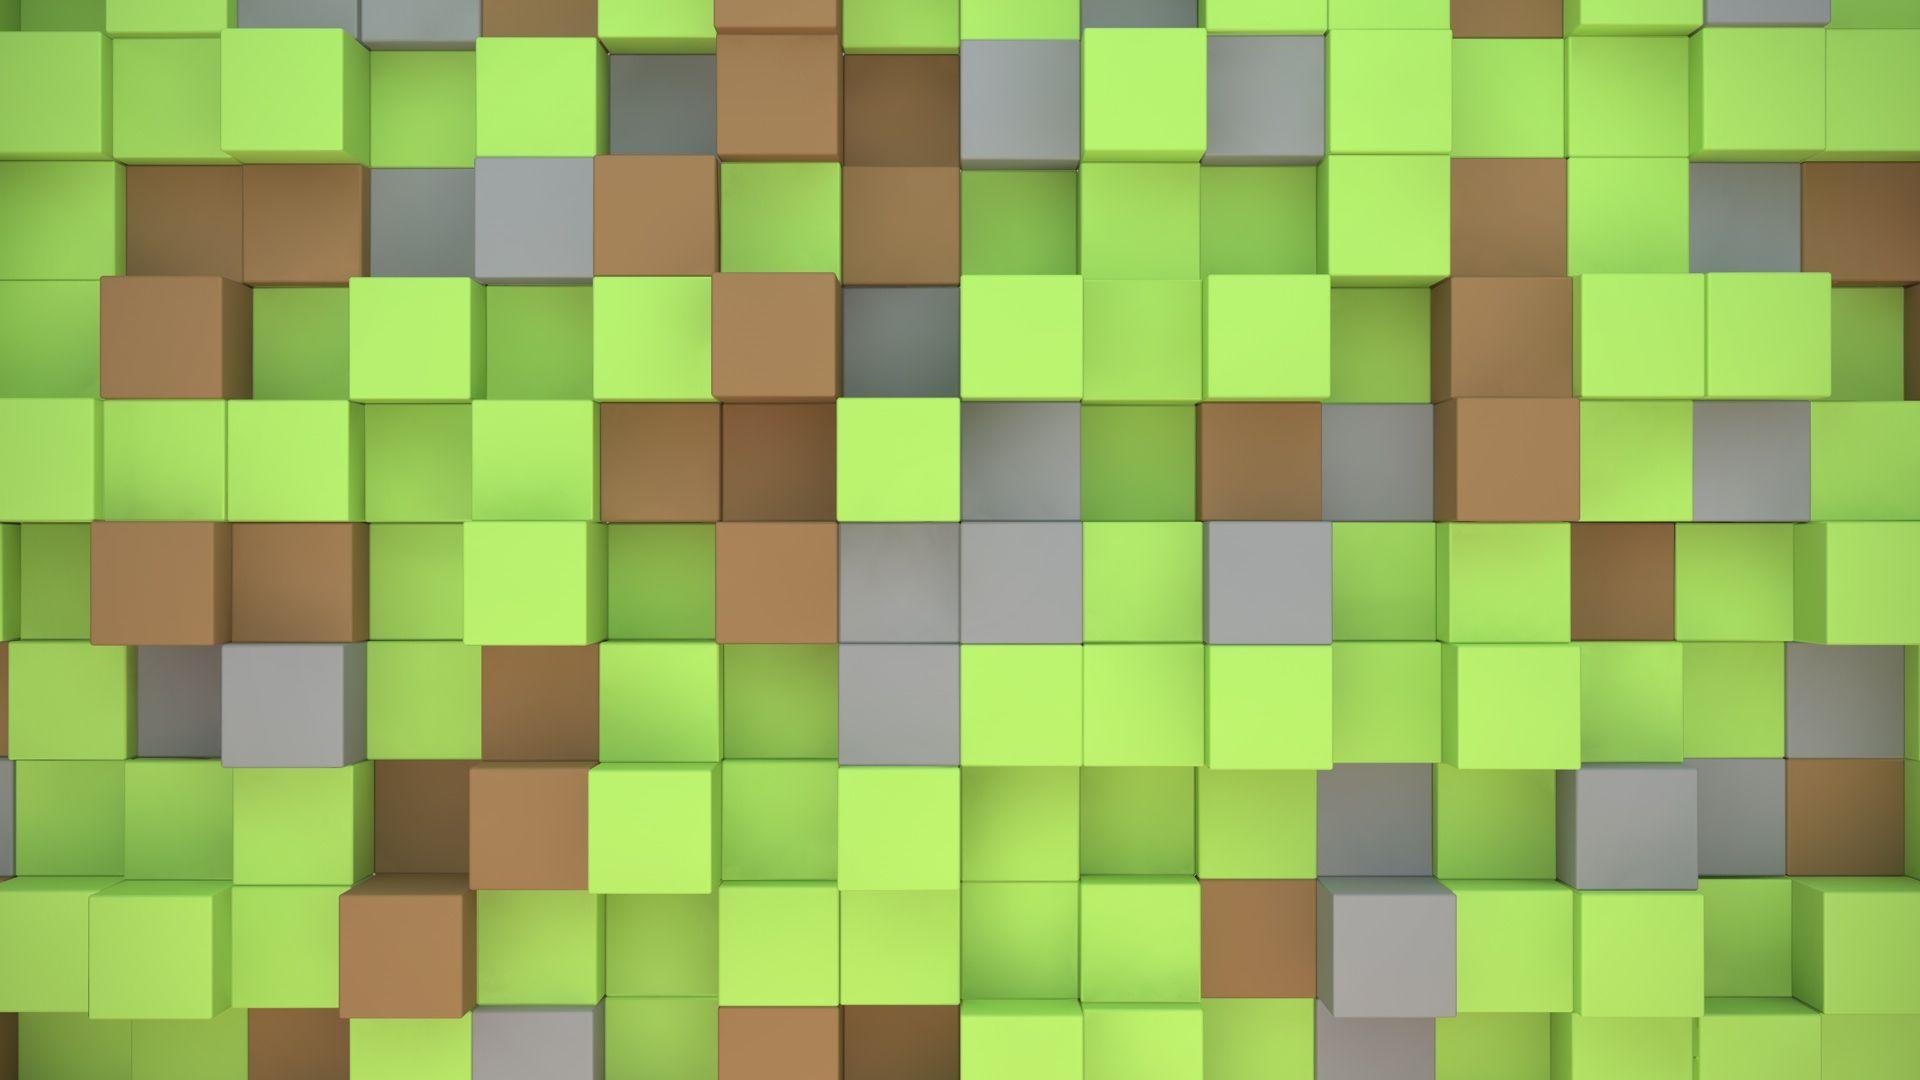 Minecraft Cubes Fond Ecran 10 000 Fonds Décran Hd